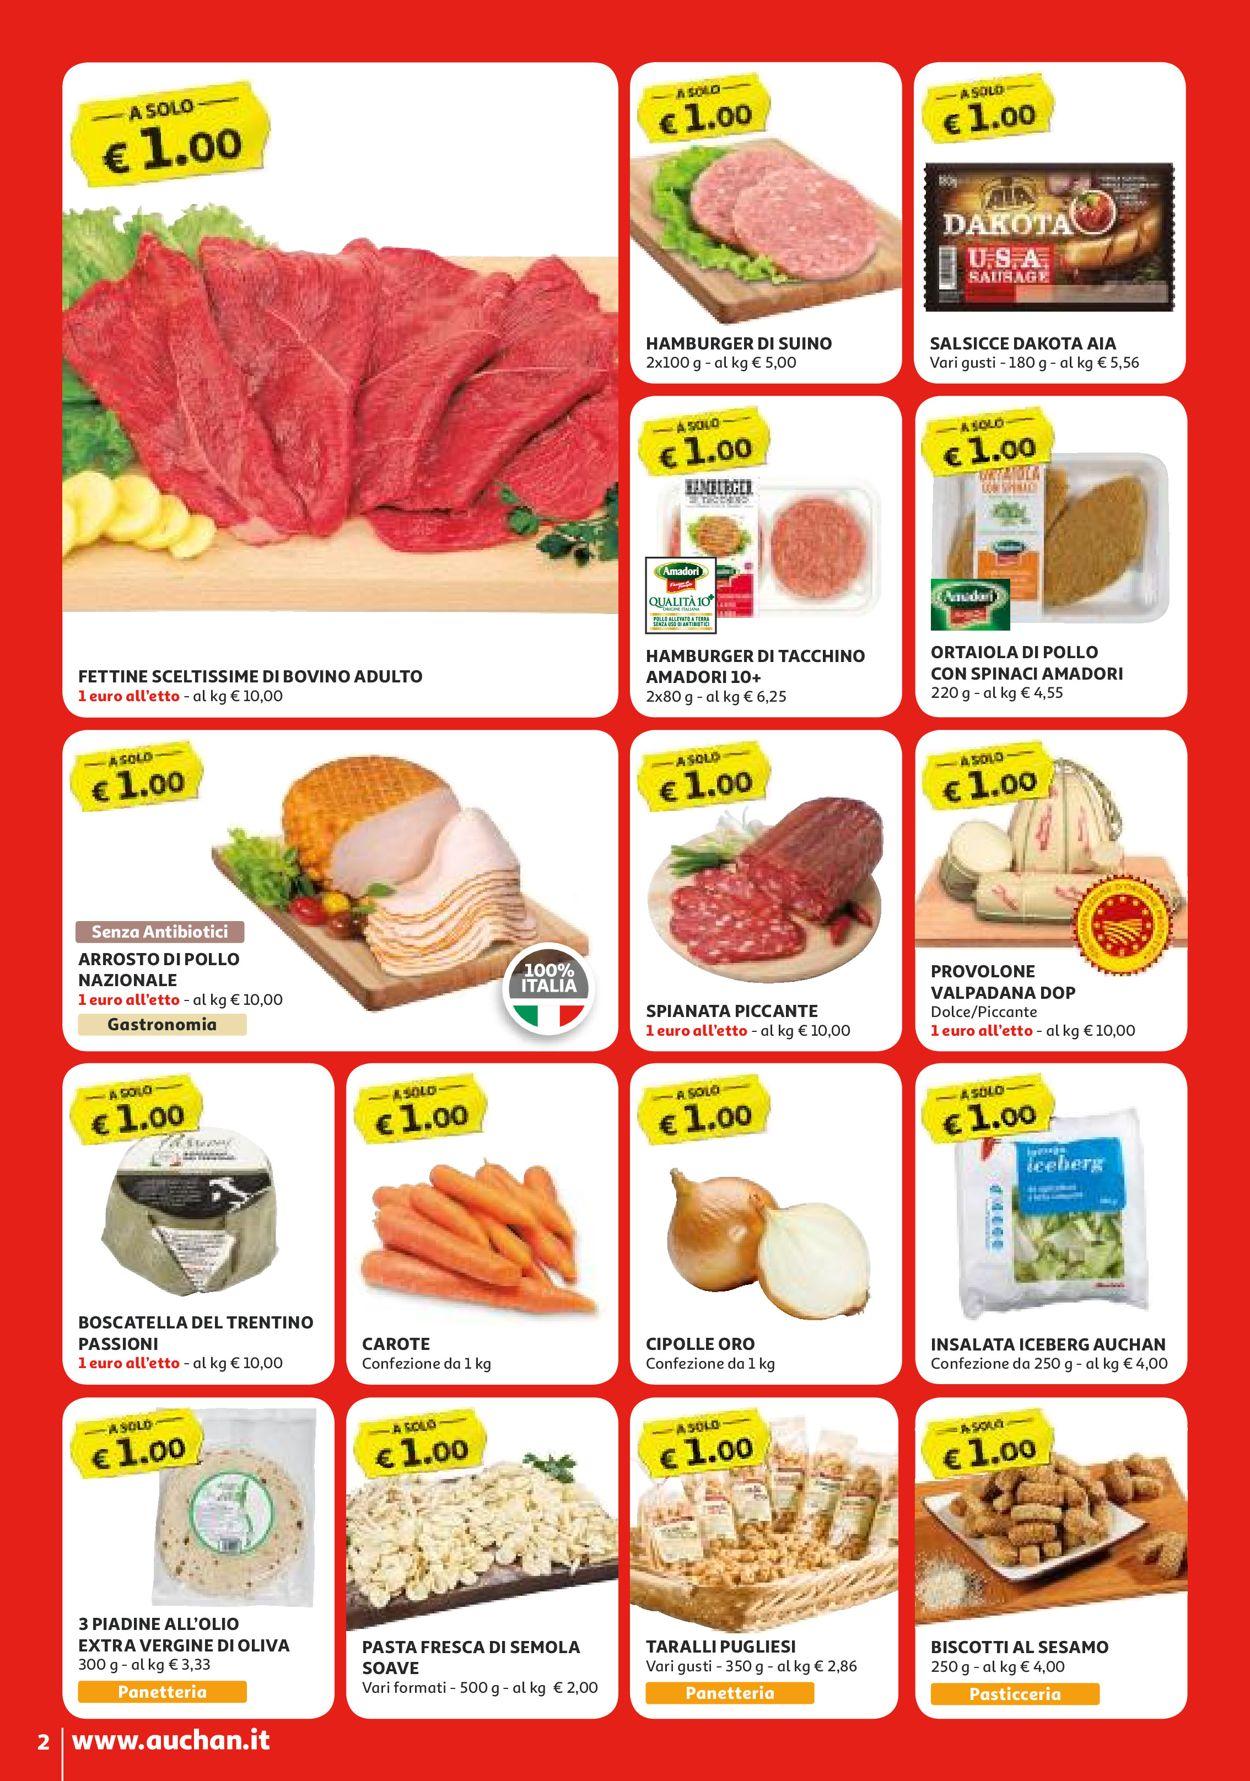 Volantino Auchan - Offerte 14/04-22/04/2020 (Pagina 2)